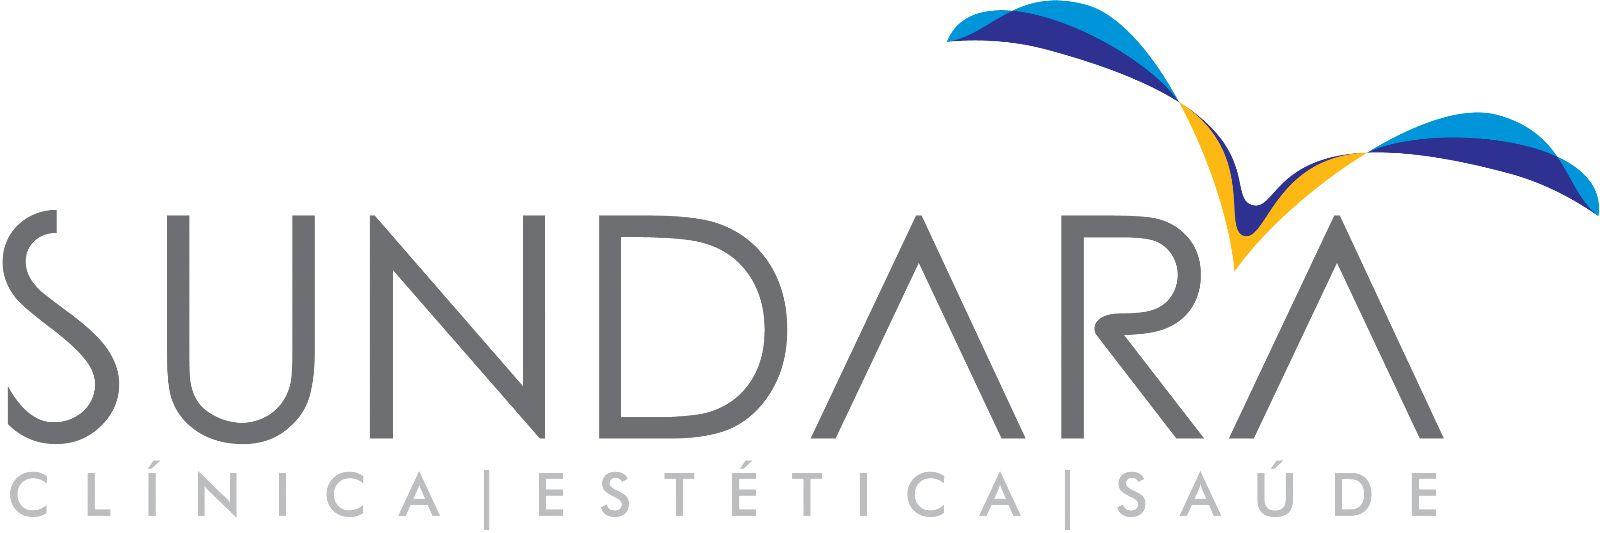 Sundara Clinica de Estetica e Saúde